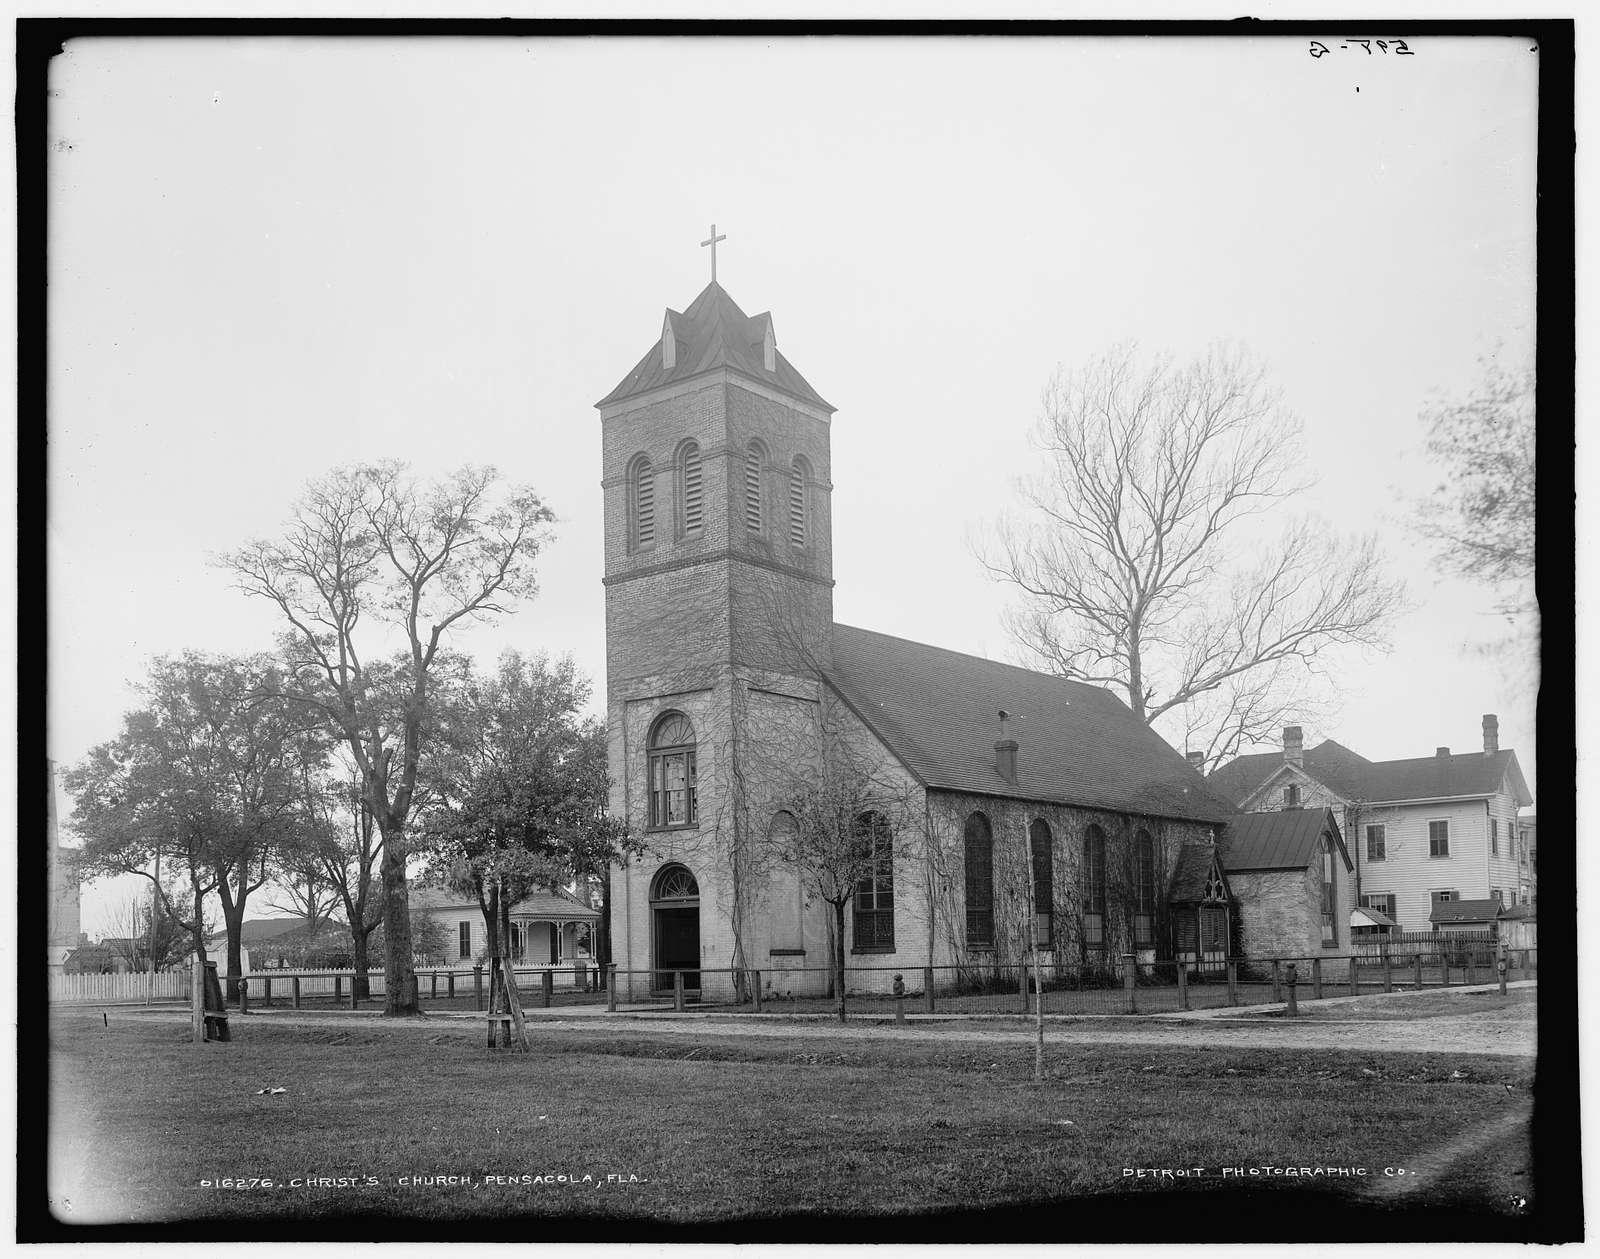 Christ's Church i.e. Old Christ Church, Pensacola, Fla